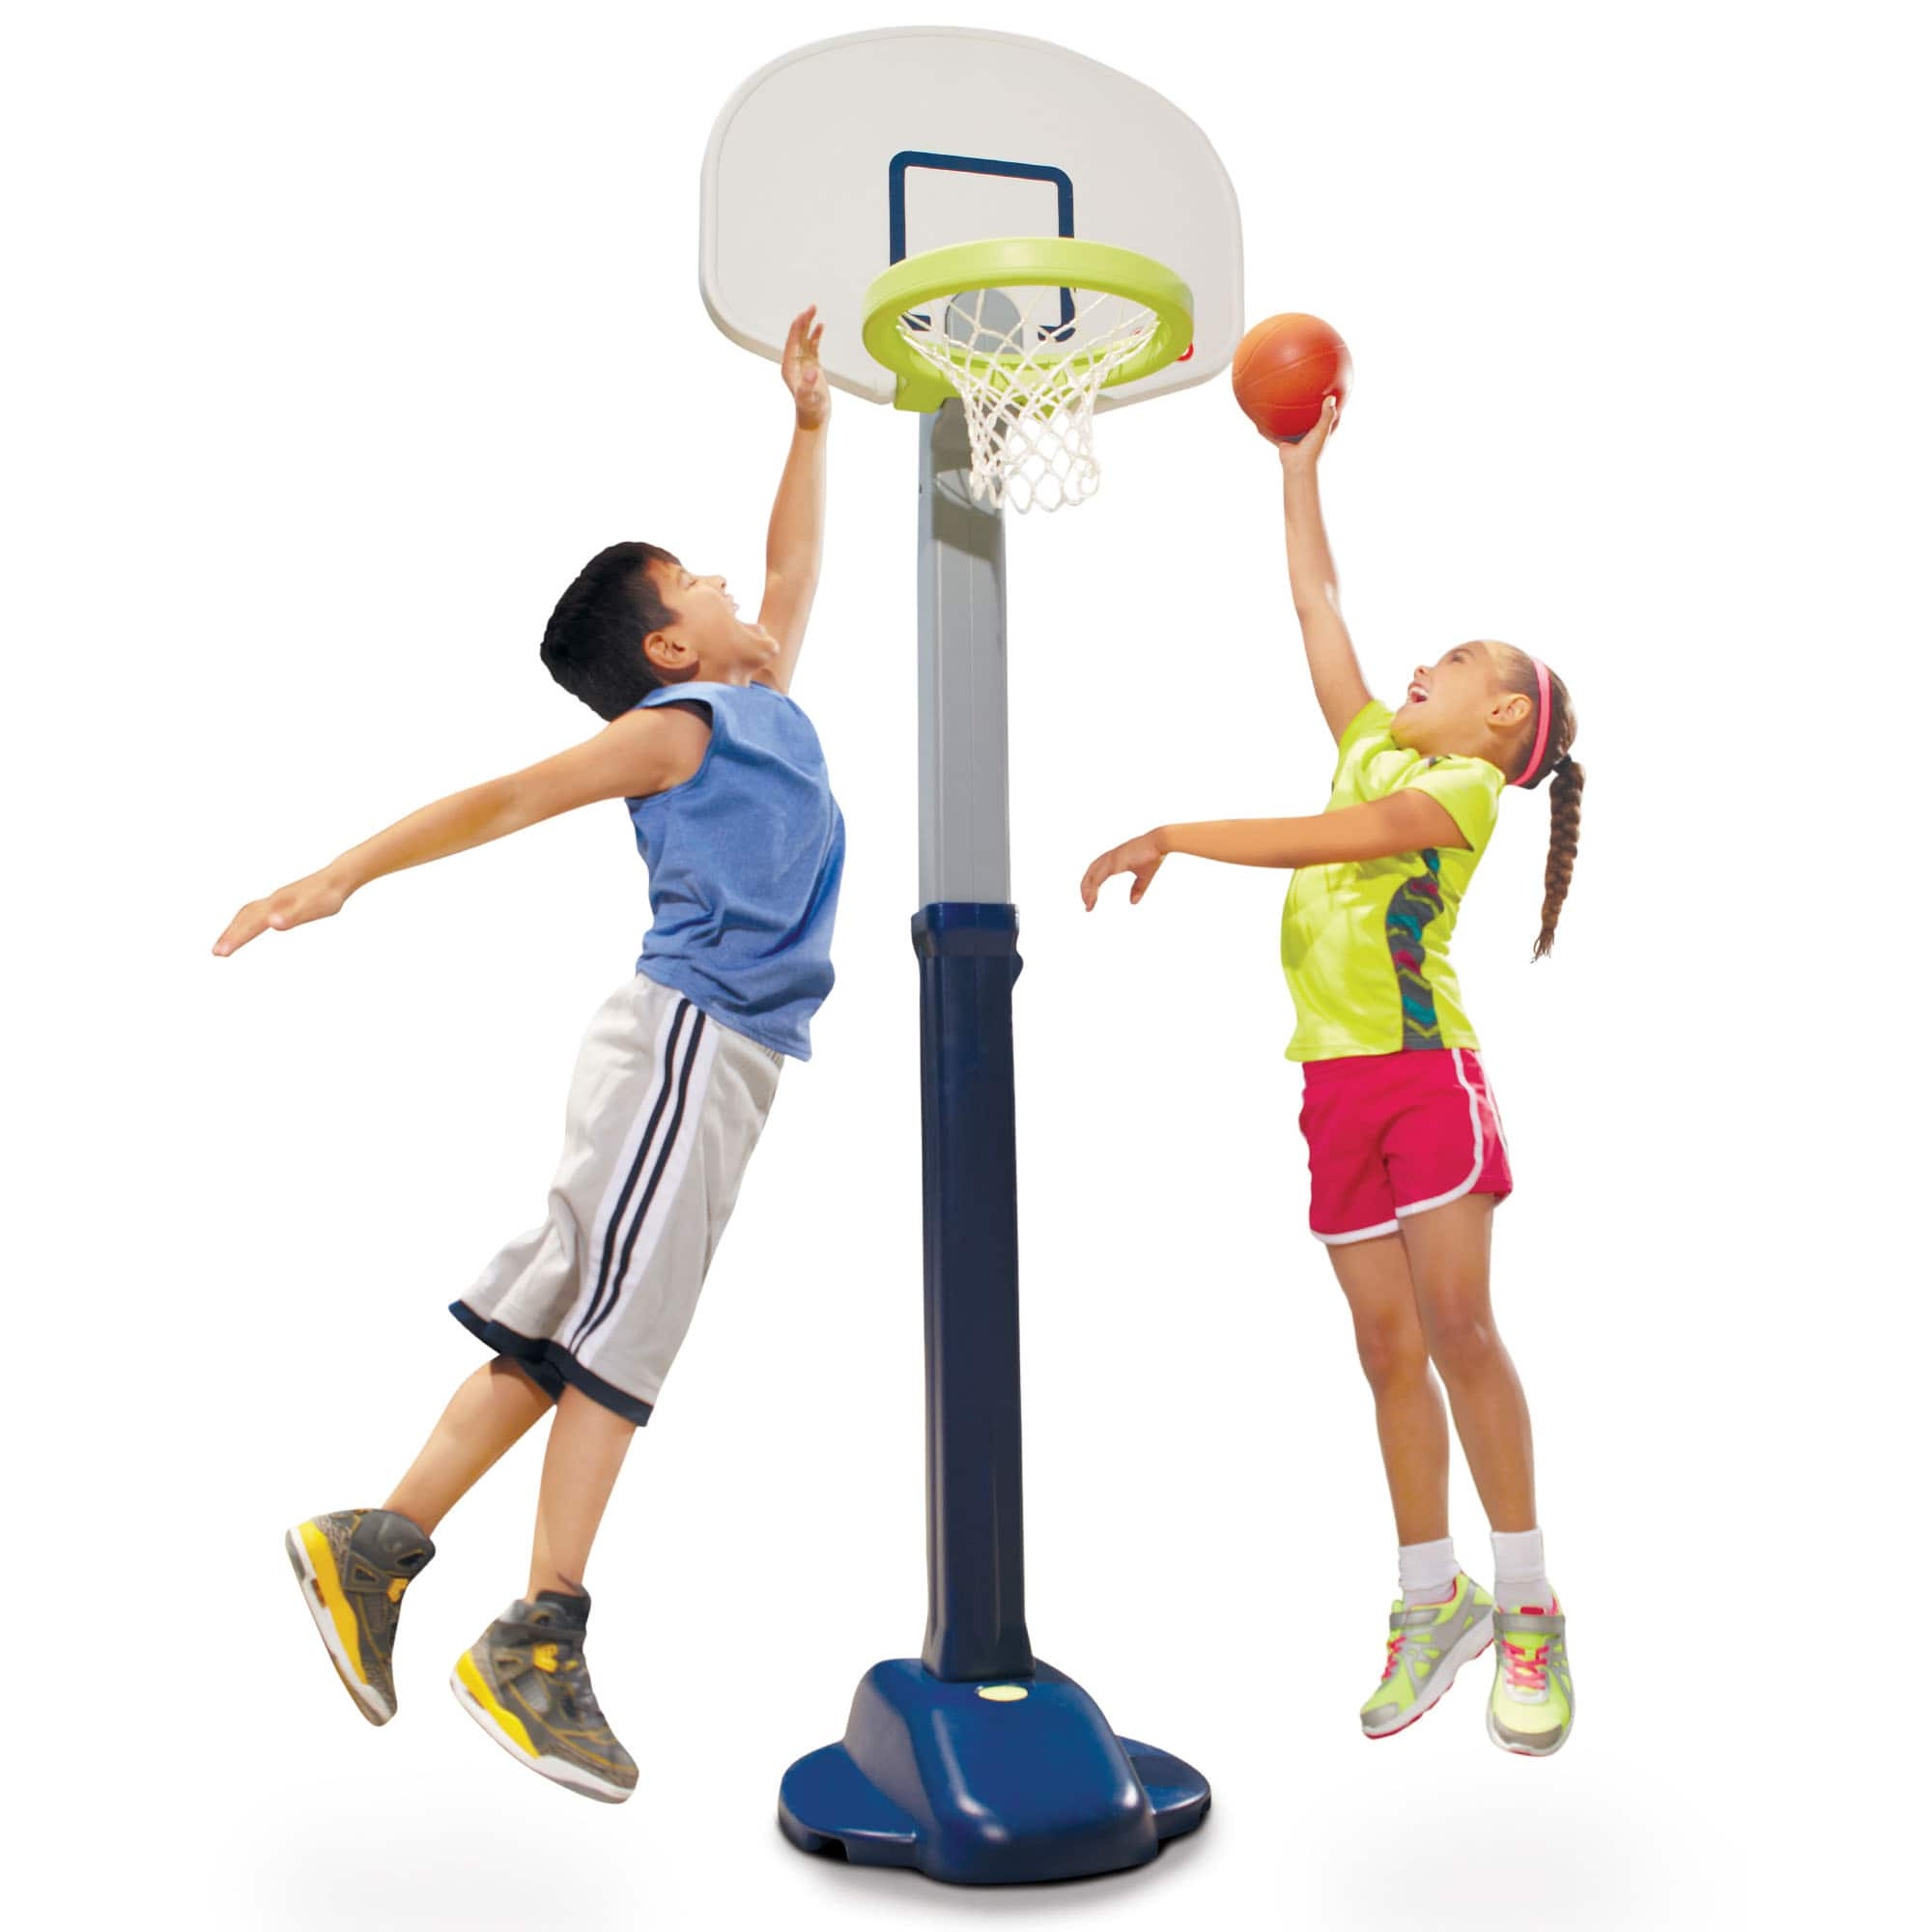 Little Tikes Adjust 'n Jam Pro Basketball Set $39.85 + Free Shipping